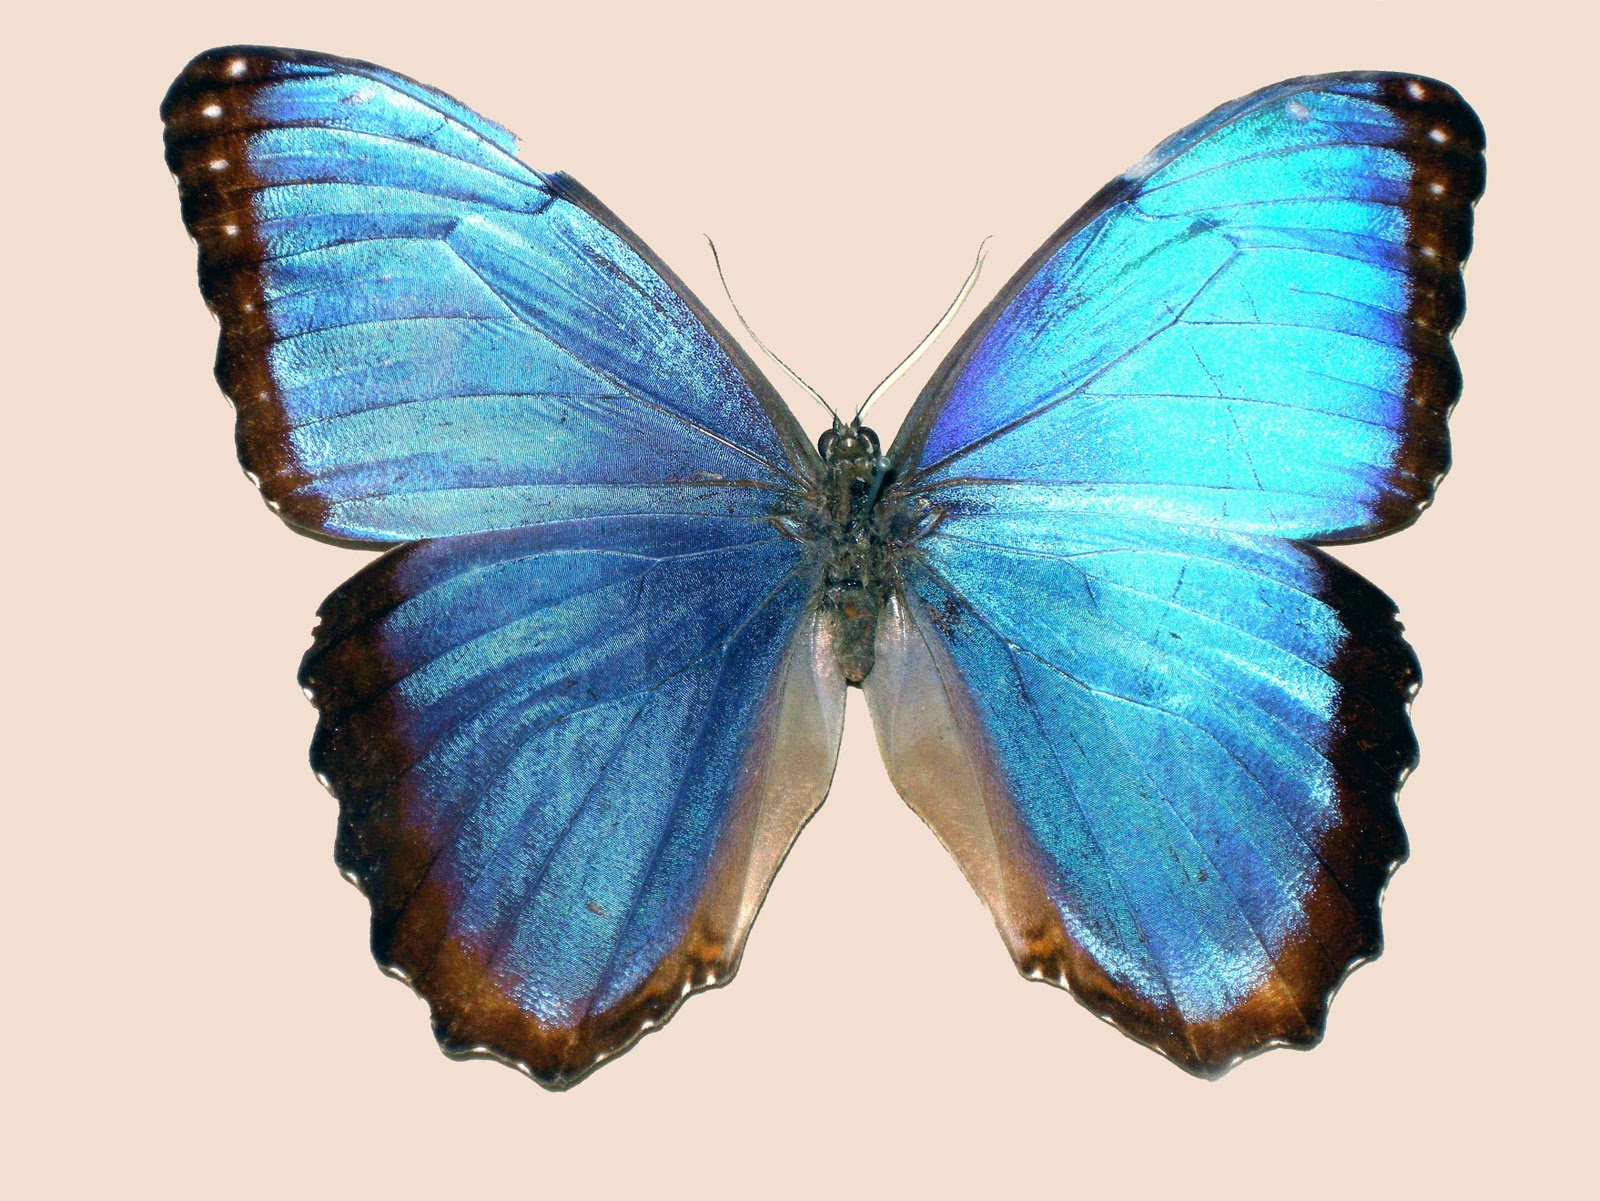 hintergrundbilder schmetterling - Butterflies Live Wallpaper: Schmetterlinge als Live